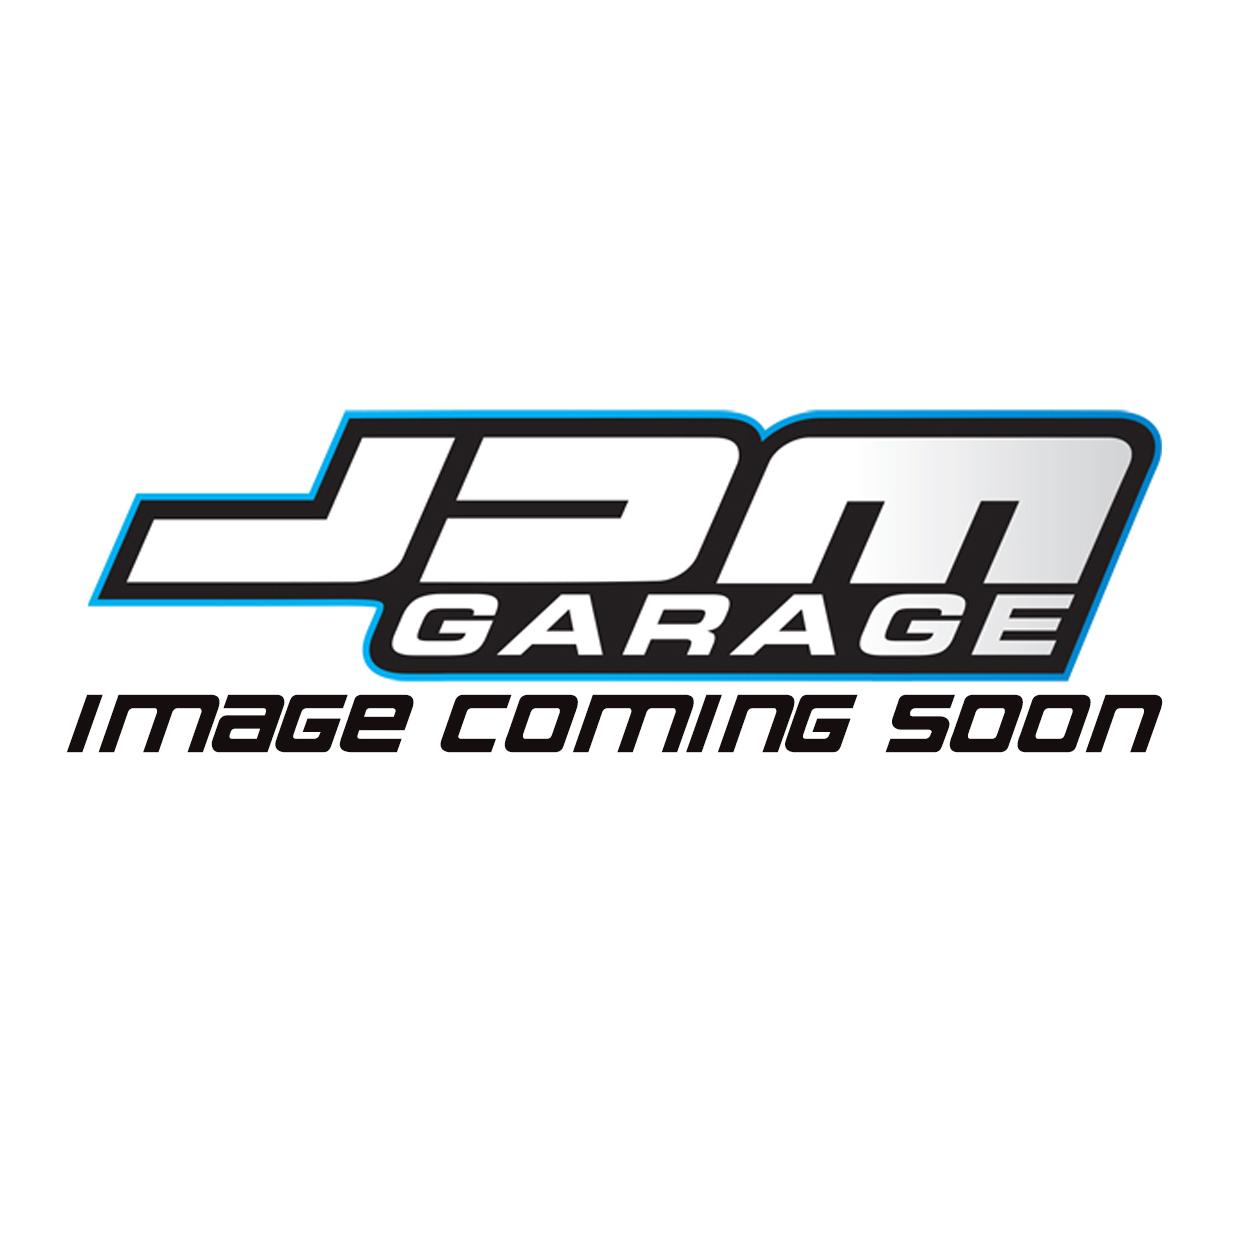 Genuine Toyota 4AGE Oil Filter Union for Corolla AE86 90404-19001